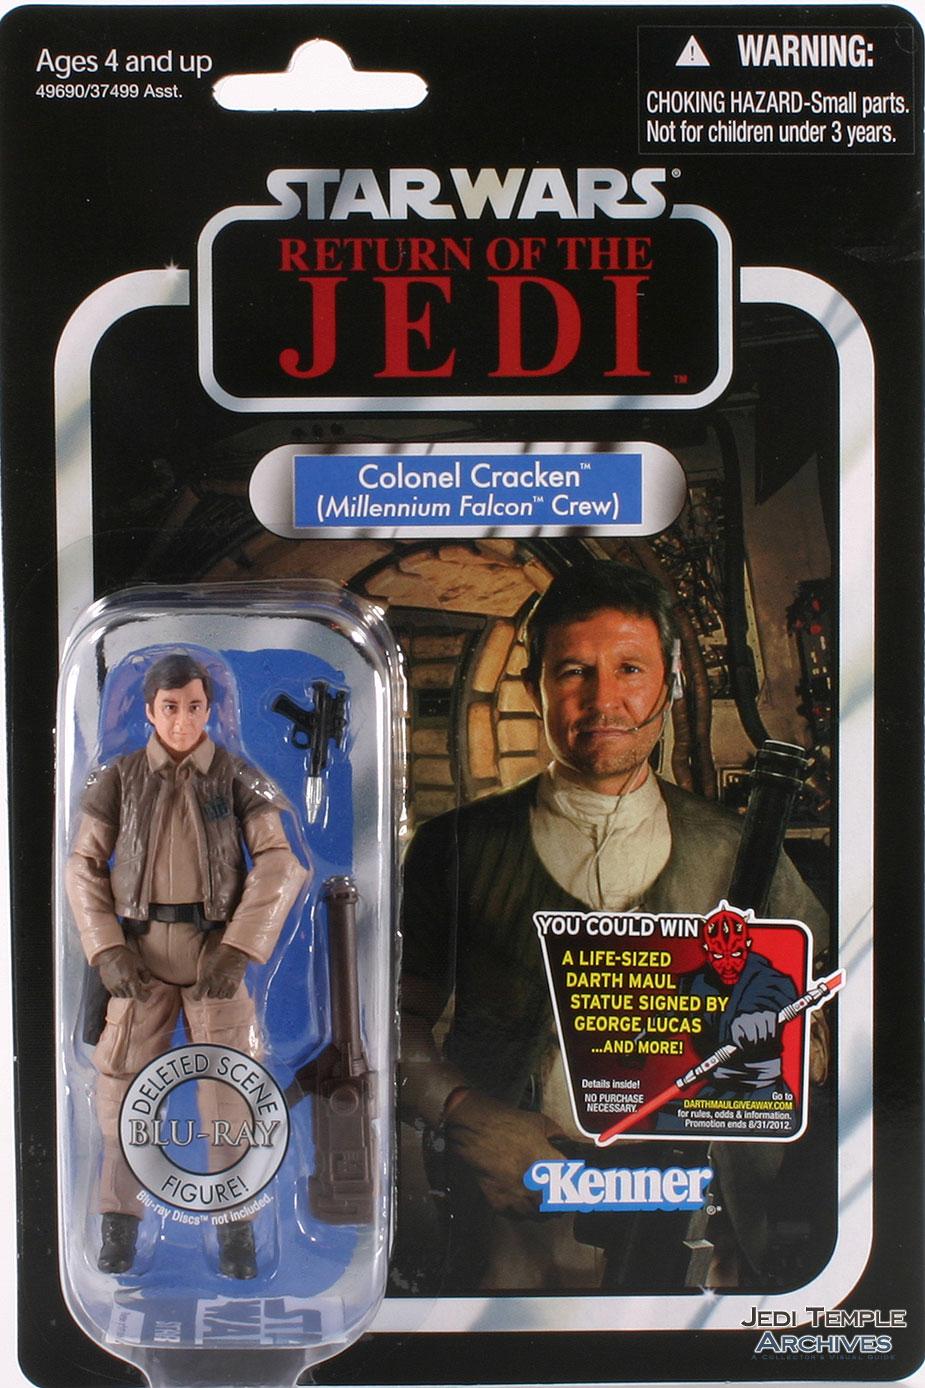 Colonel Cracken (Millennium Falcon Crew)